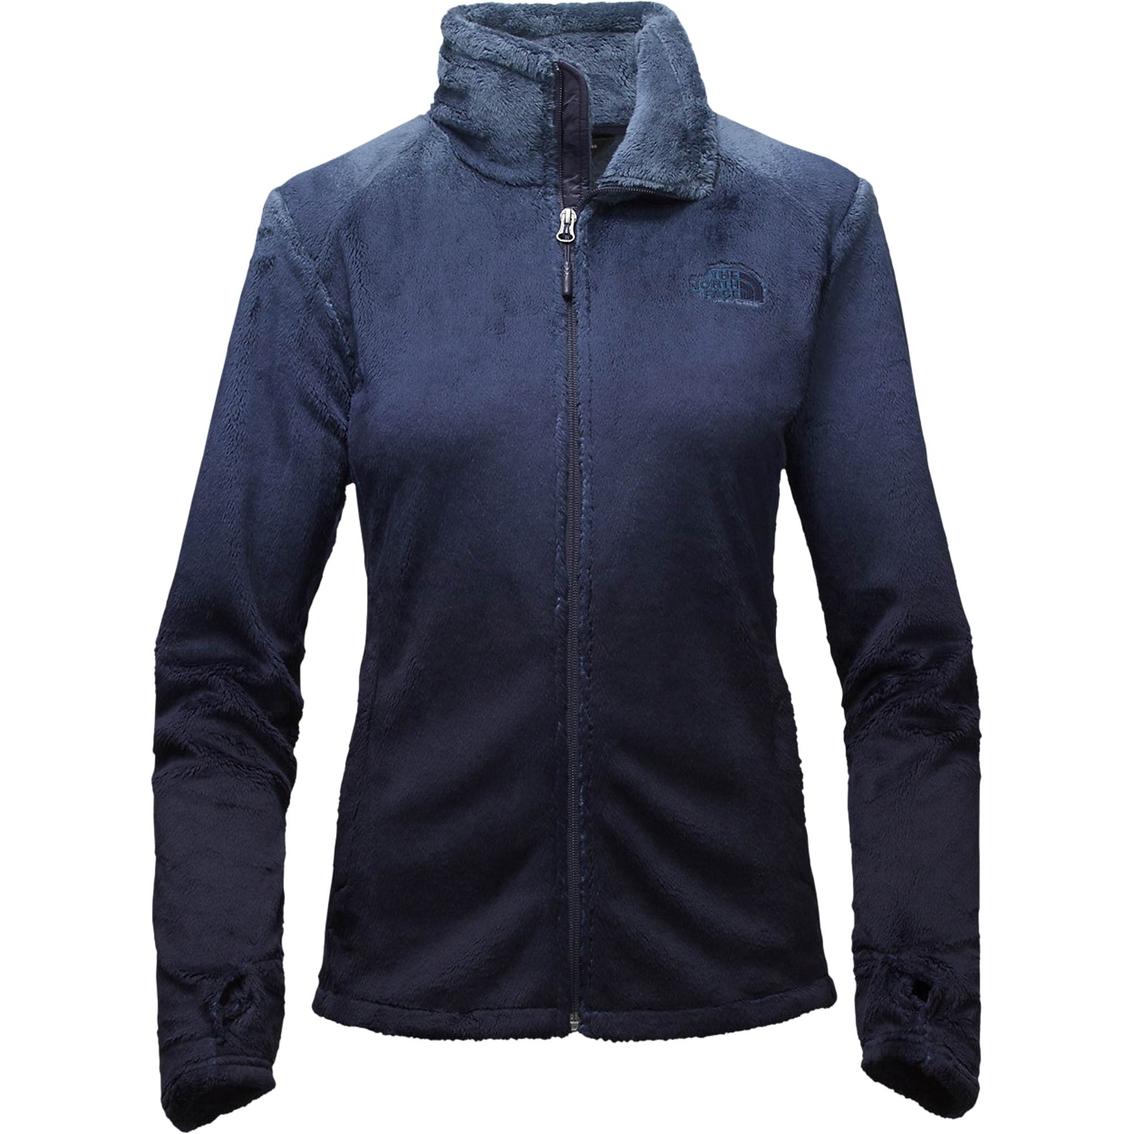 740437157413 The North Face Novelty Osito Jacket